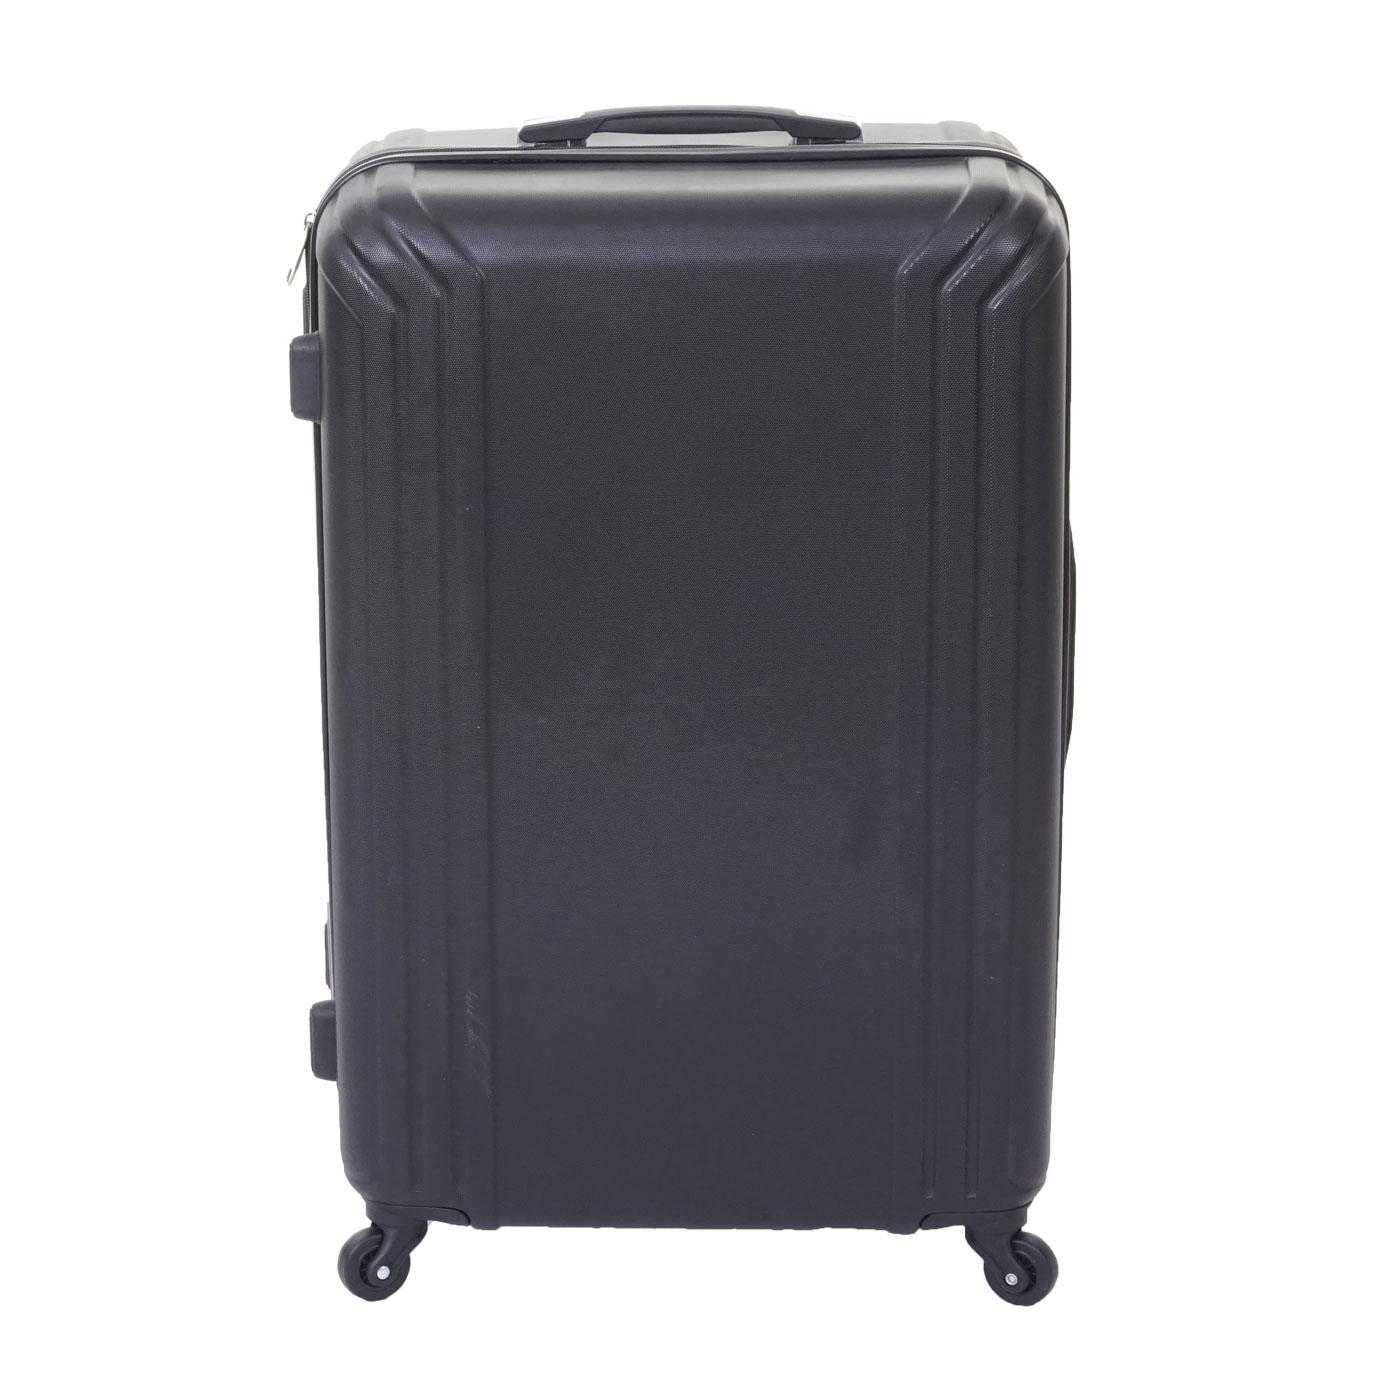 Koffer-Set HWC-D54